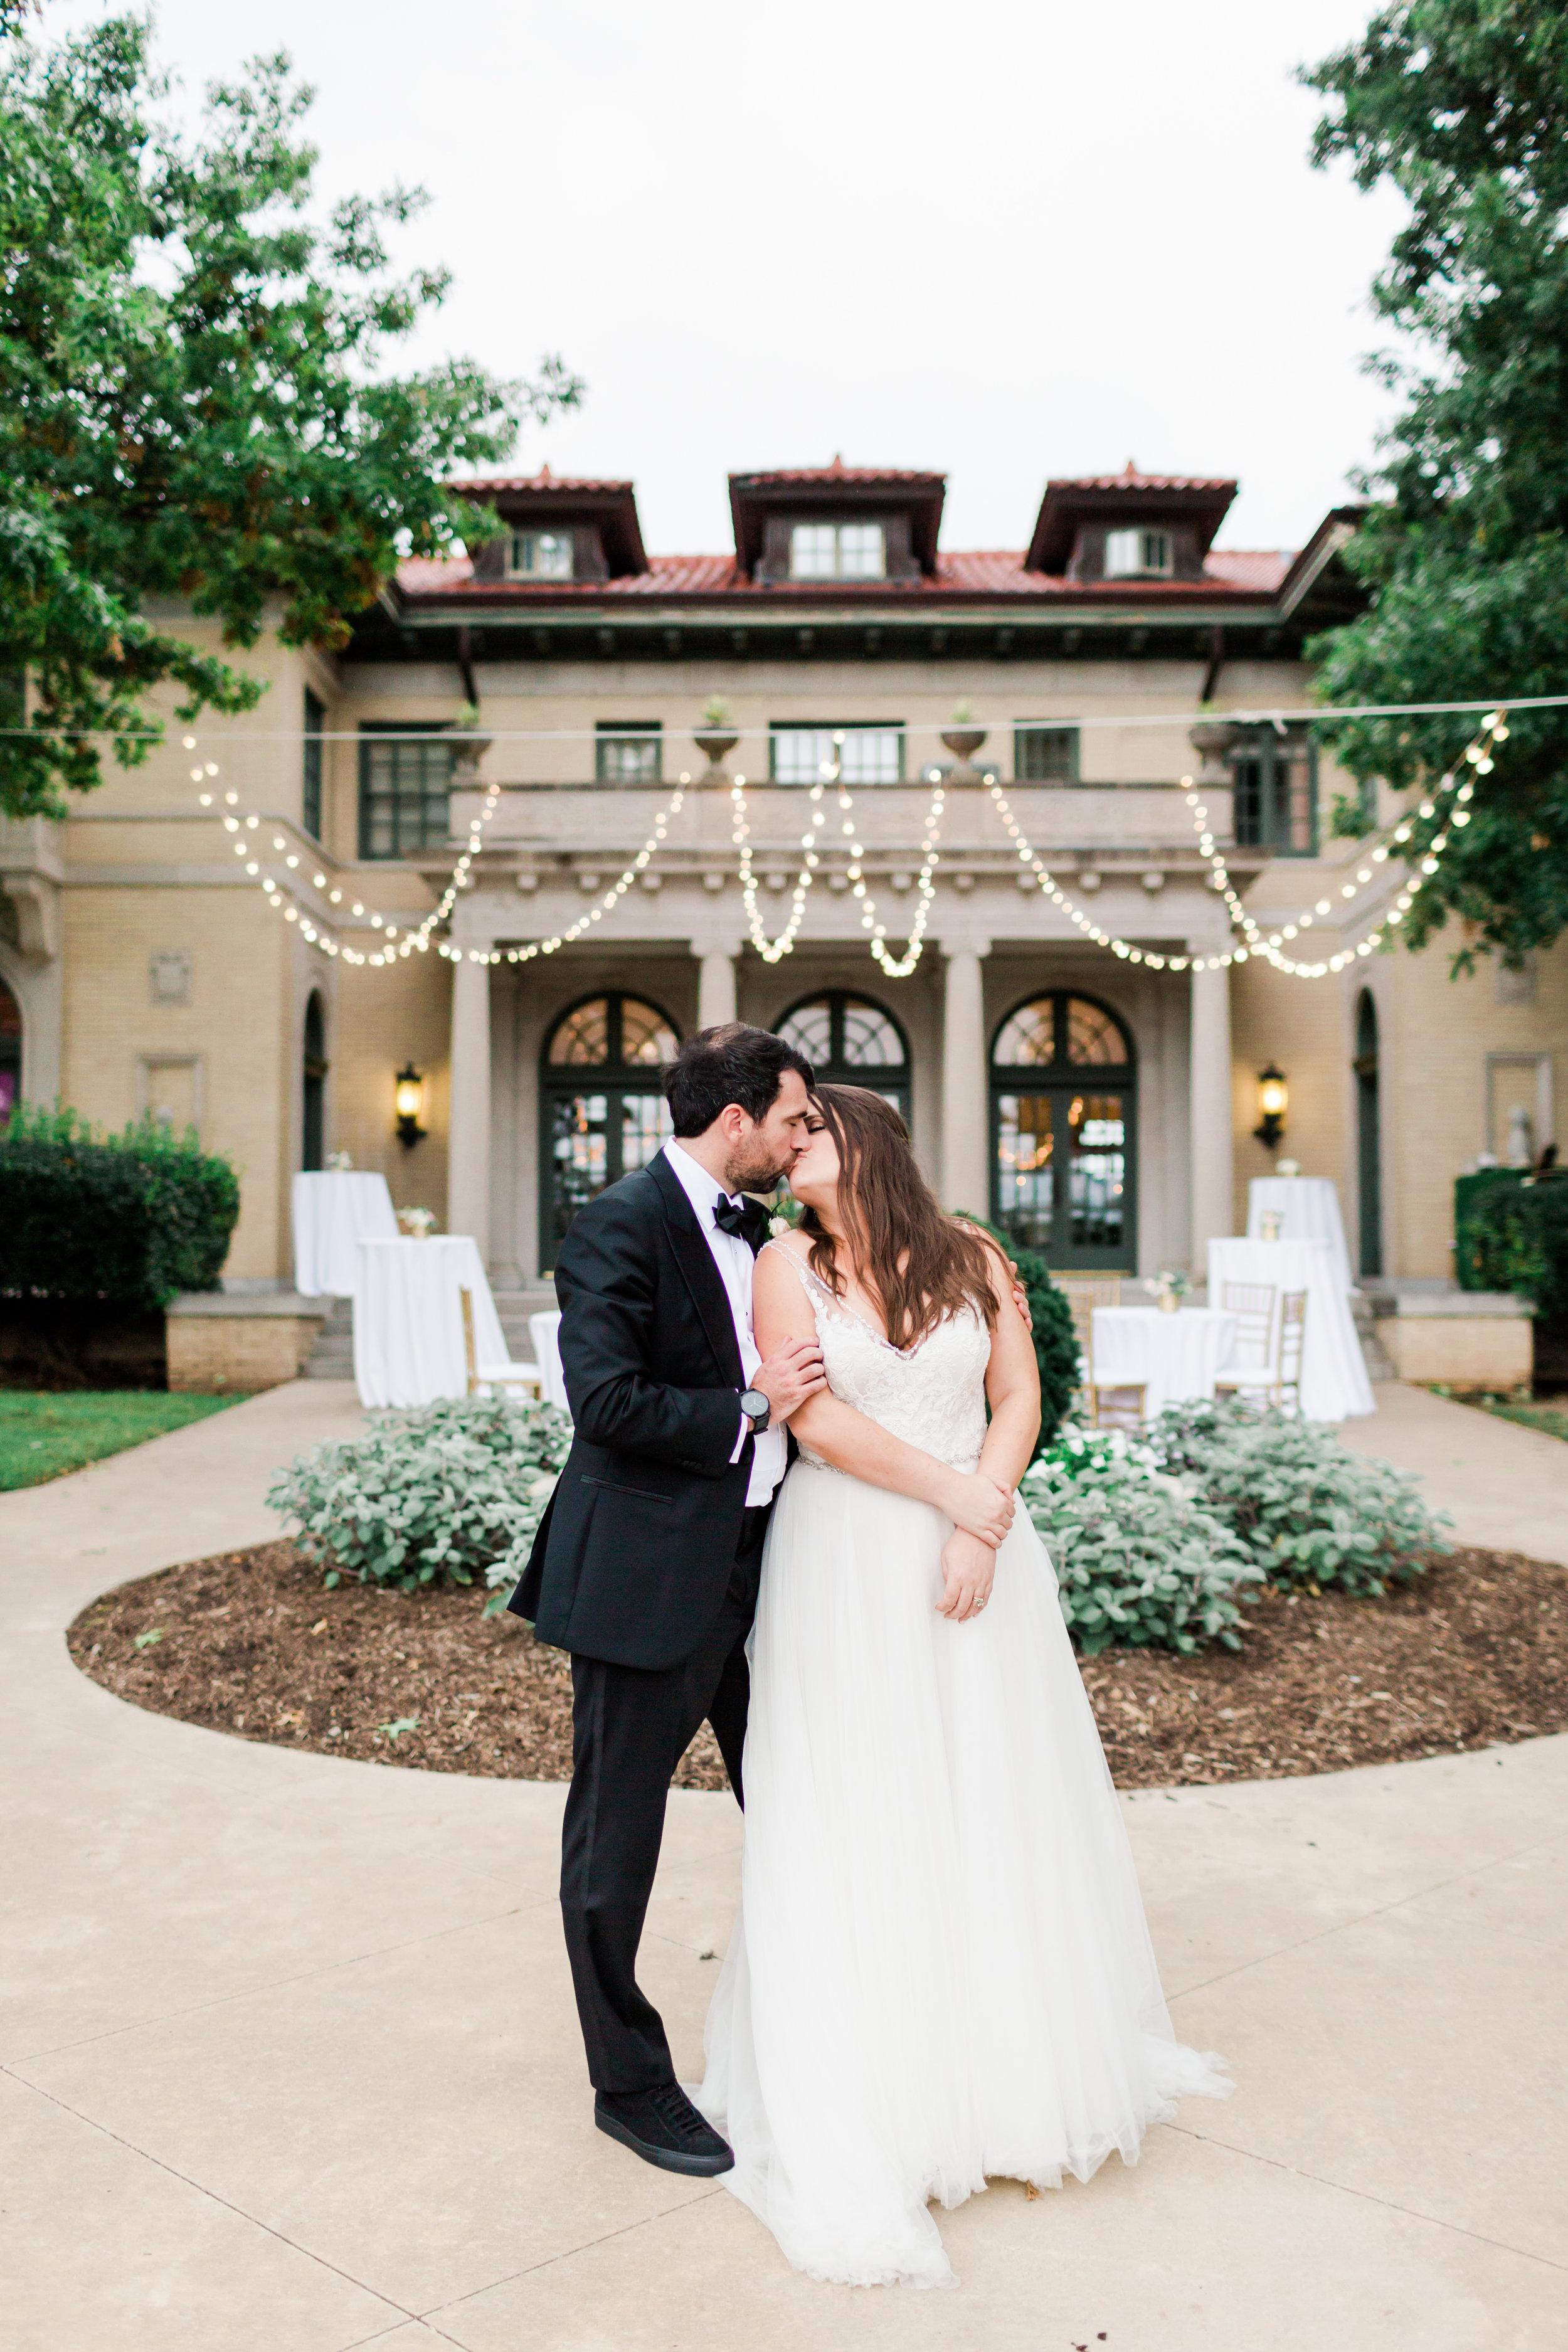 The Mansion at Woodward Park Tulsa Oklahoma Wedding_Valorie Darling Photography-6627-2.jpg